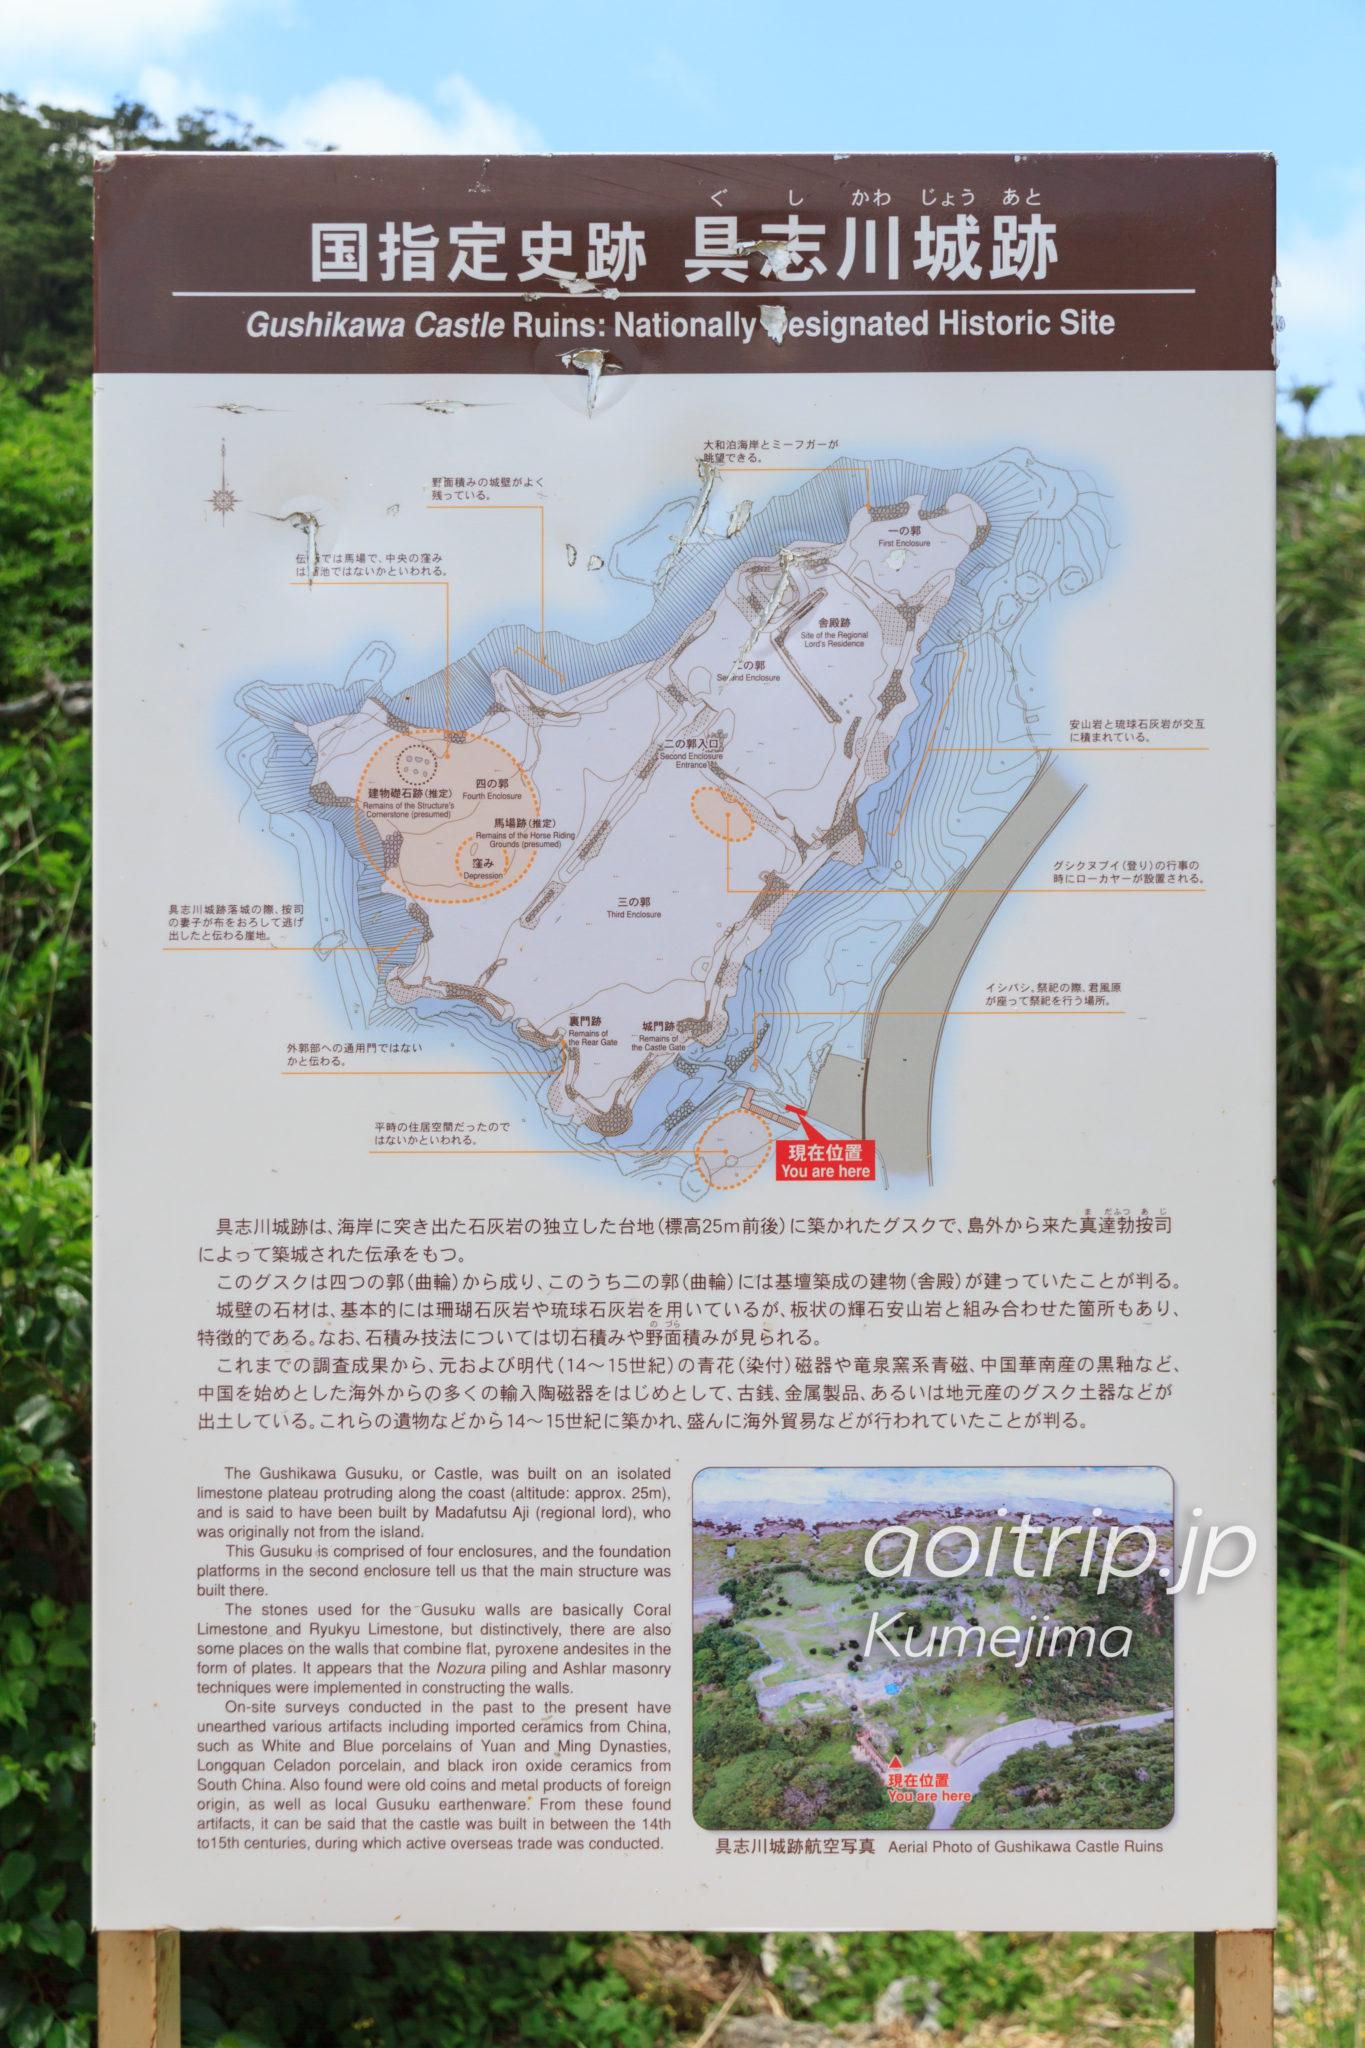 久米島 具志川城跡の平面図と解説